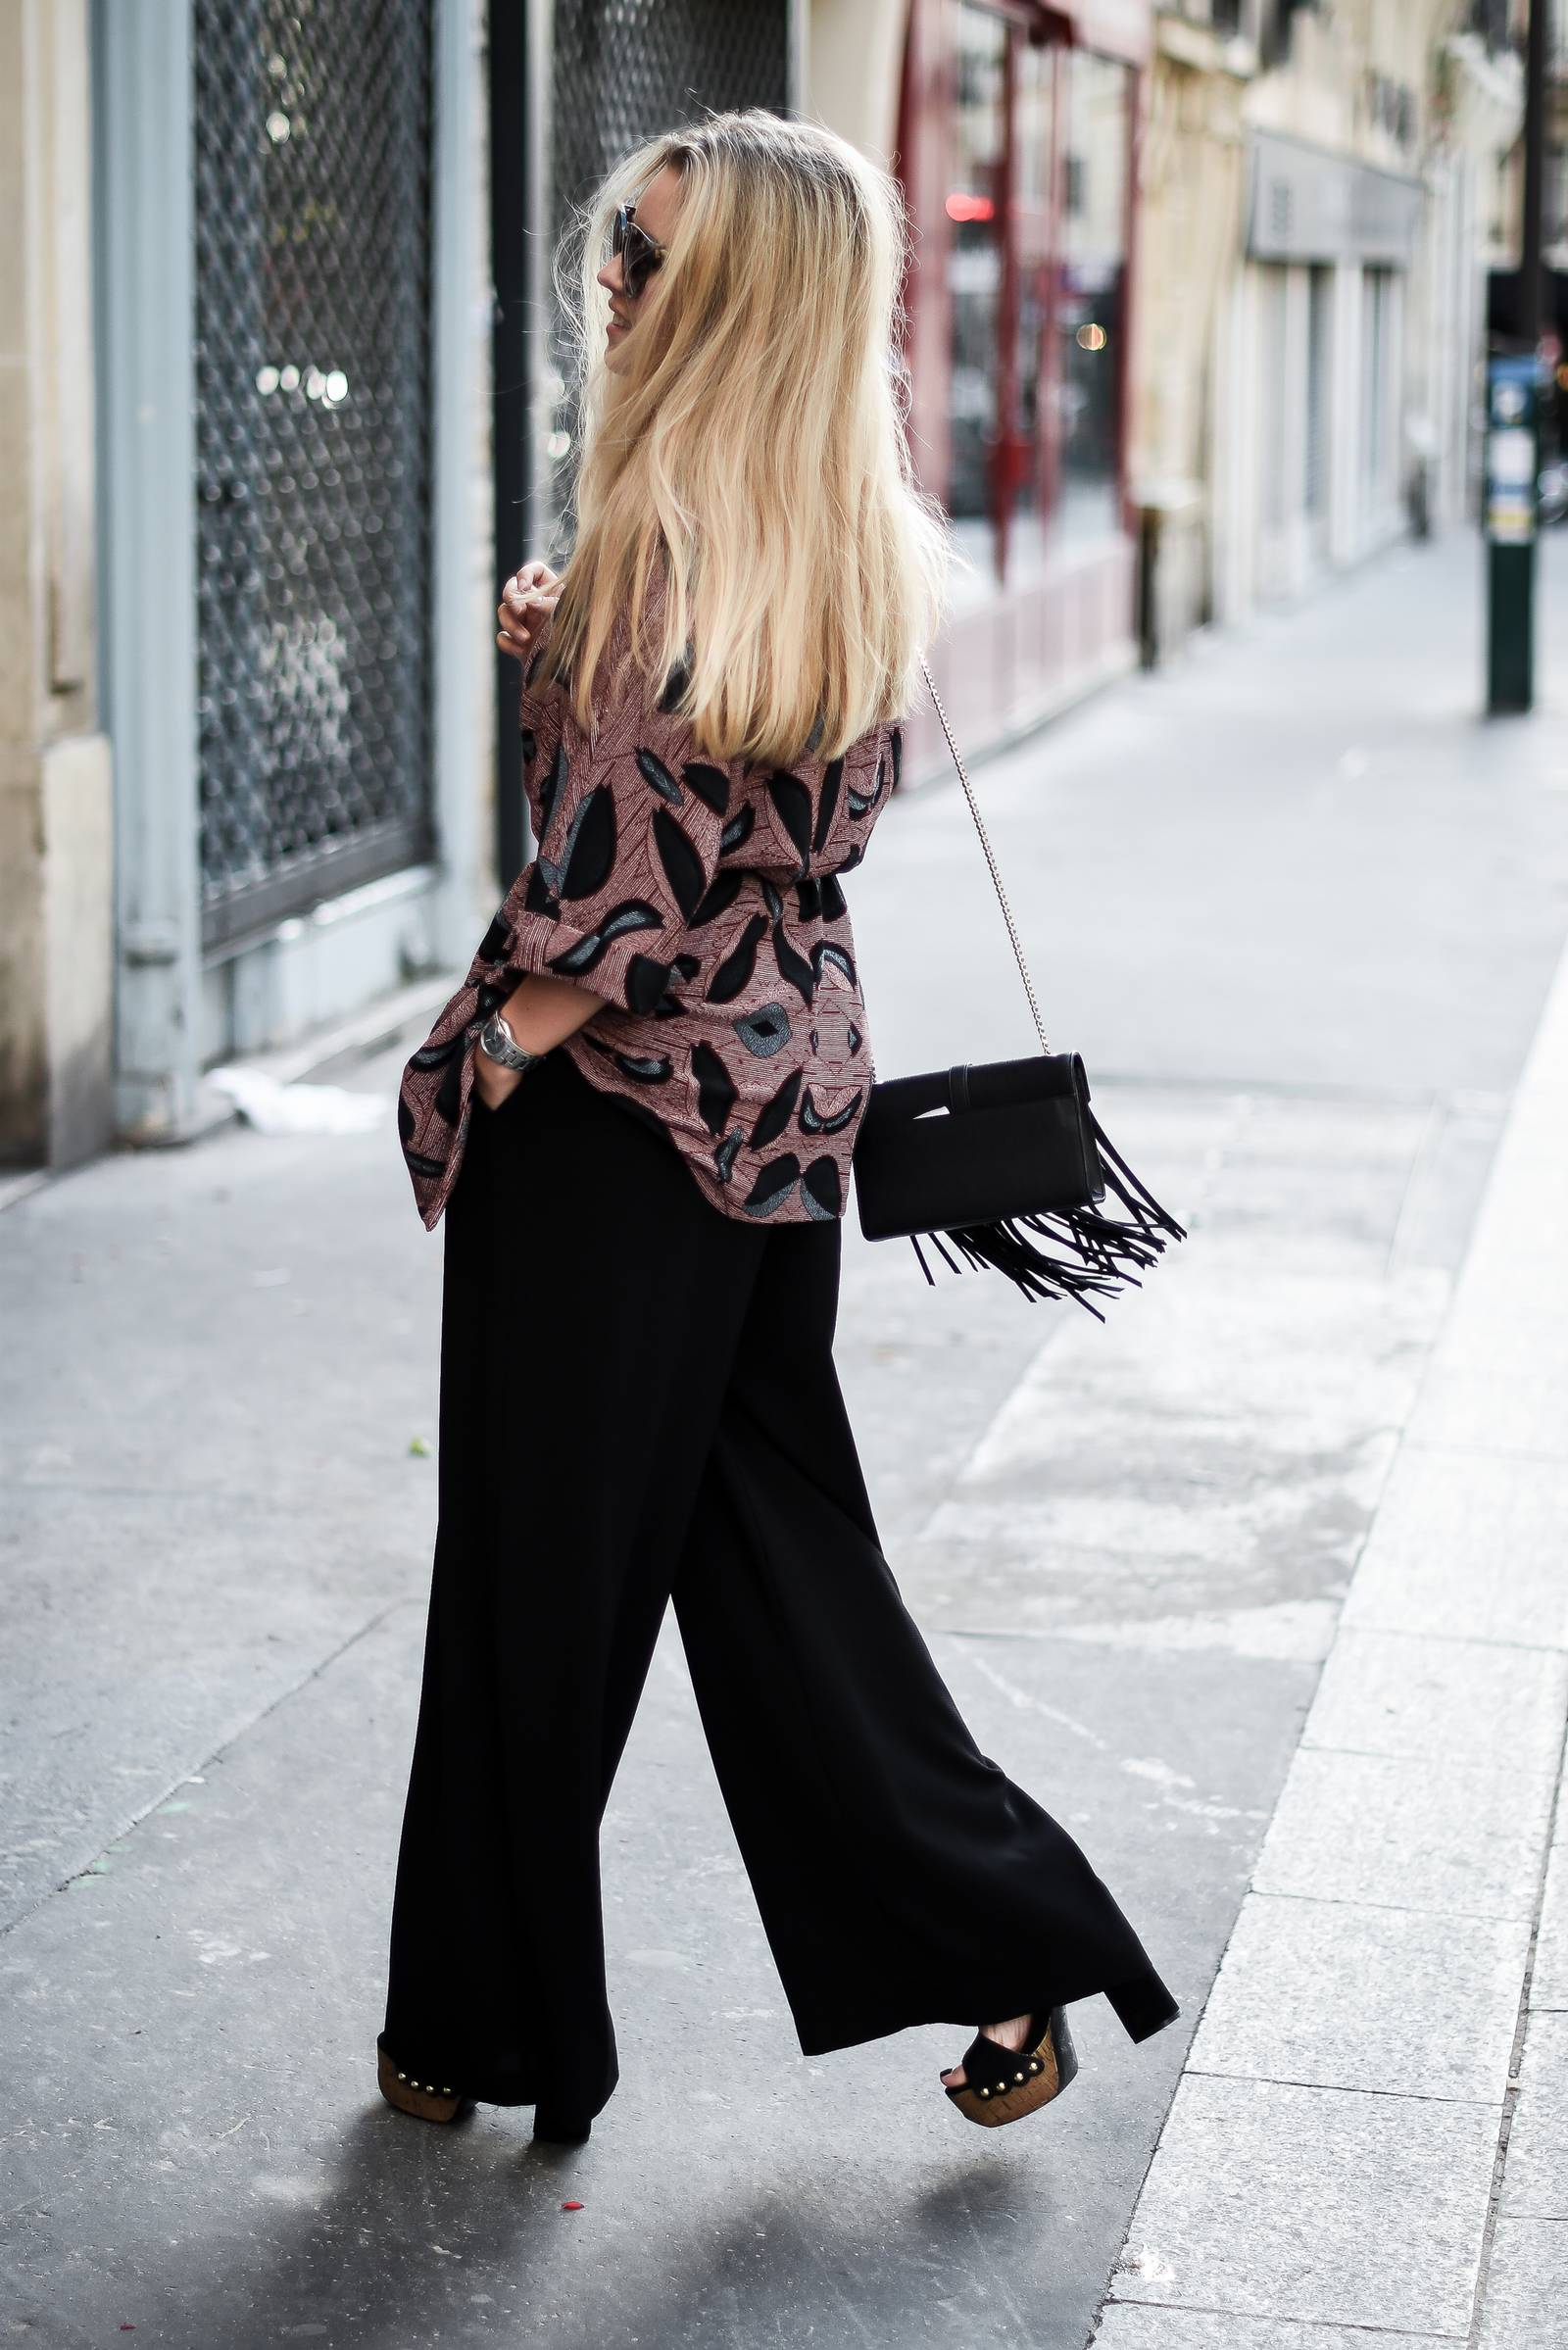 blog mode - Comment s'habiller pour aller au restaurant 4